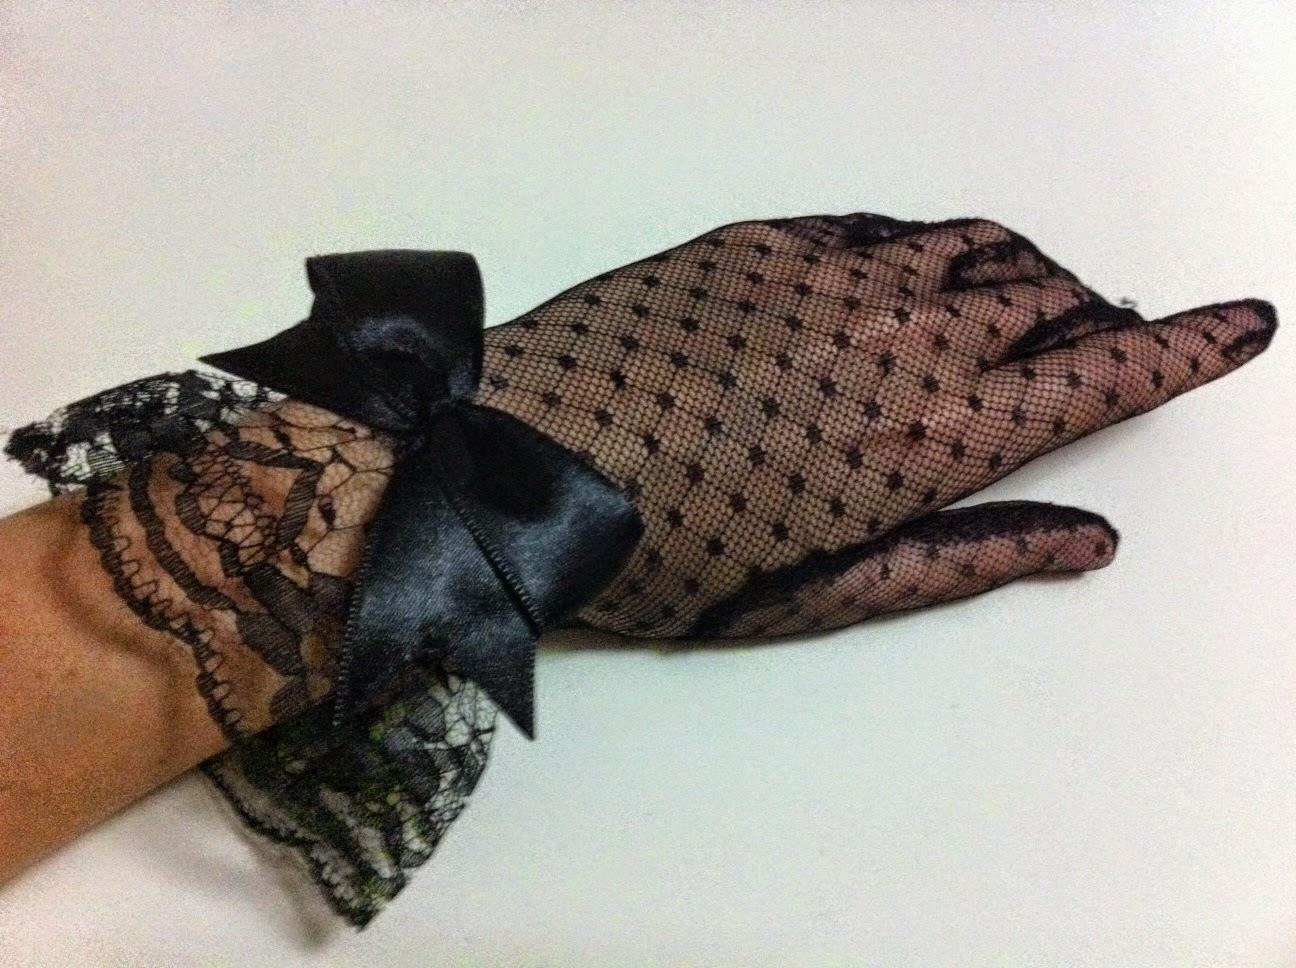 siyah puantiyeli tül eldiven nikah eldiveni